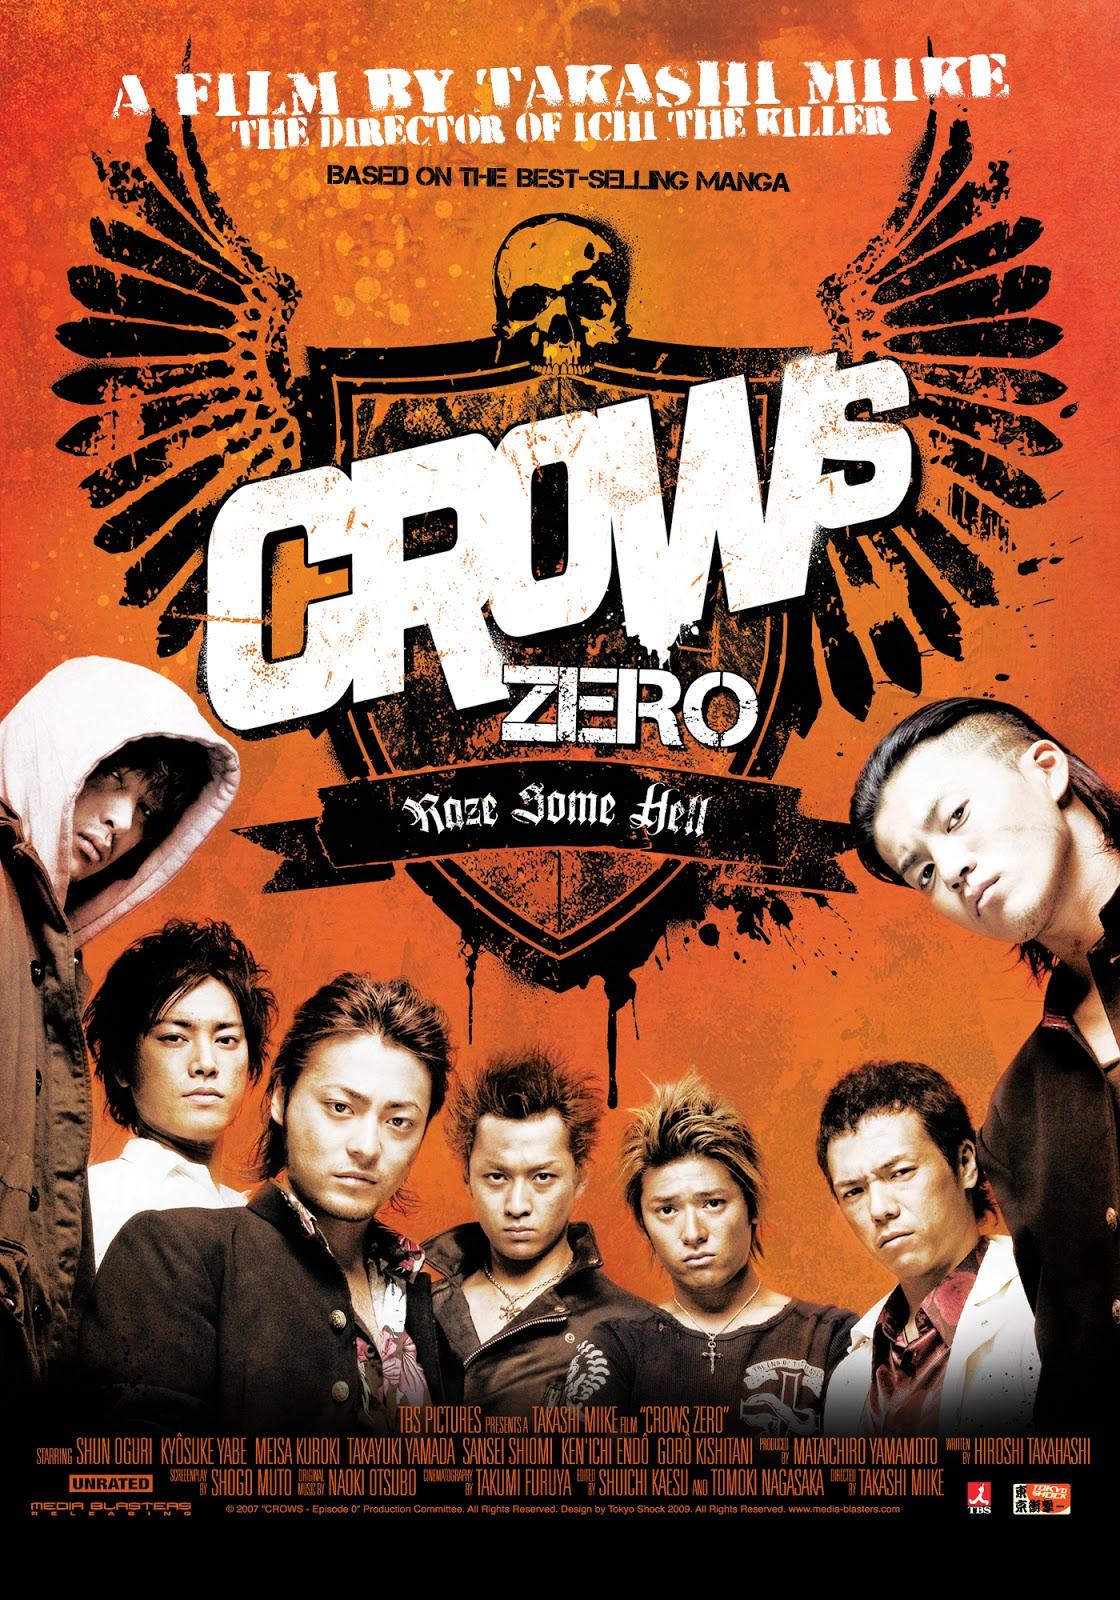 Download film crows zero 4 subtitle indonesia